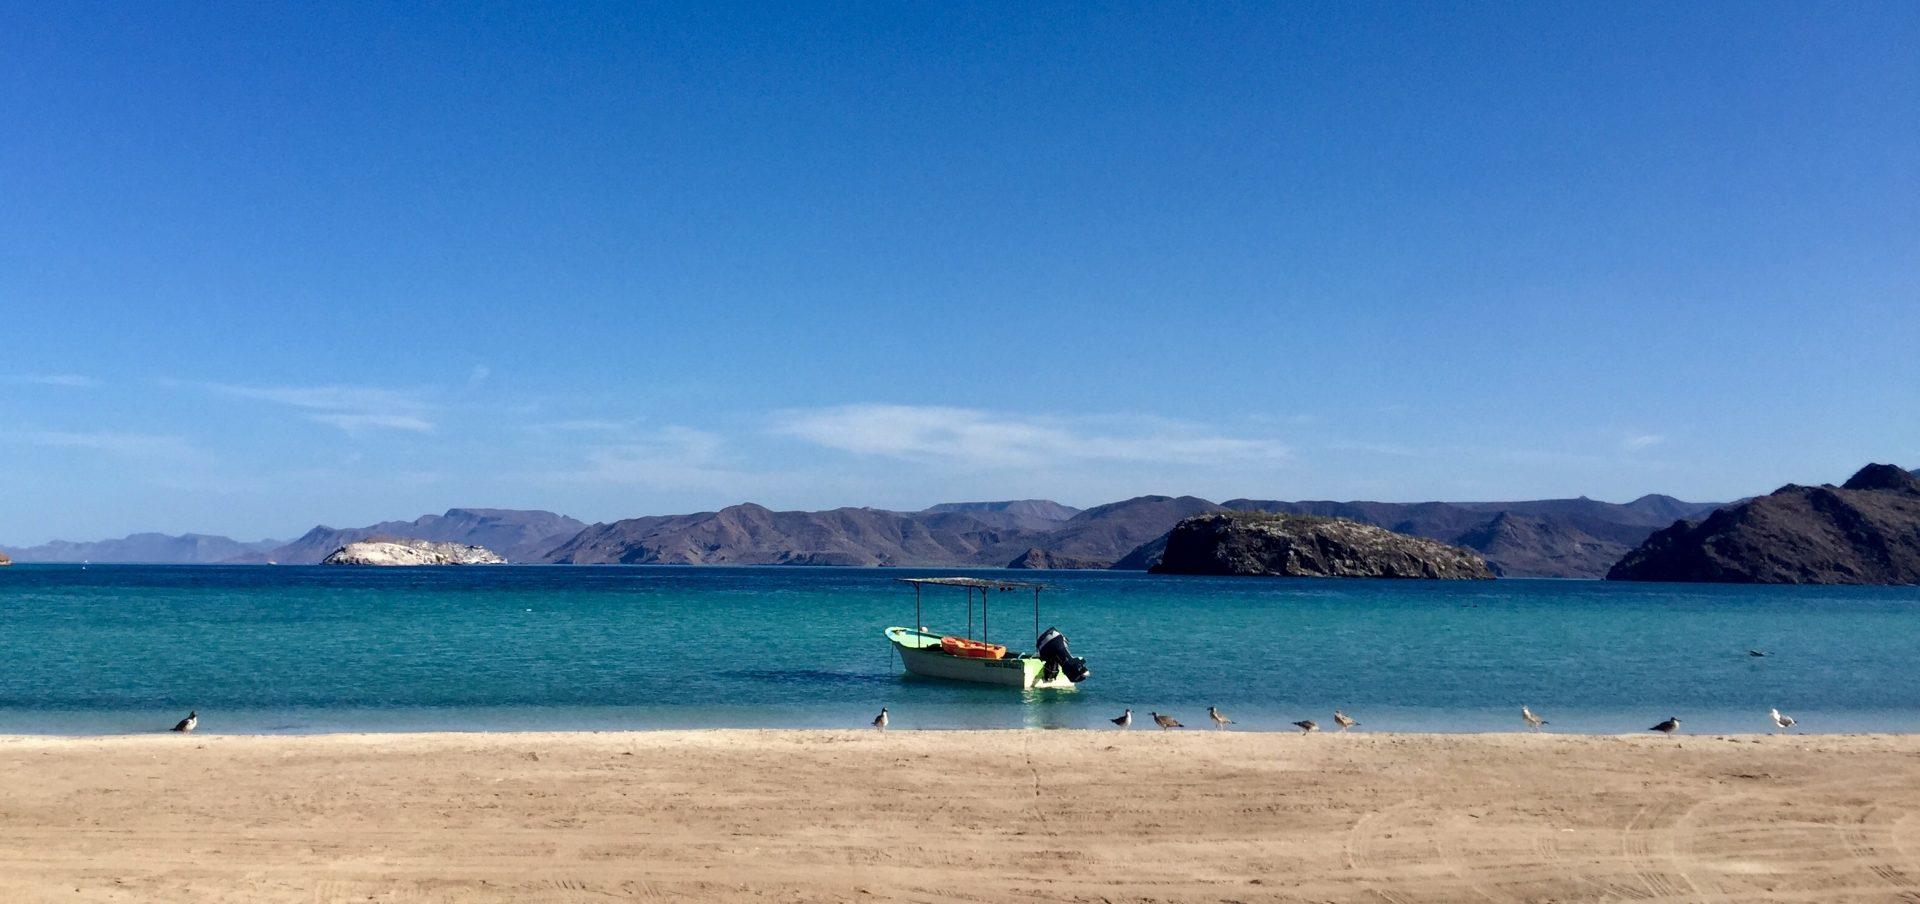 Mexico Baja Part 5 (June 24 to 27)